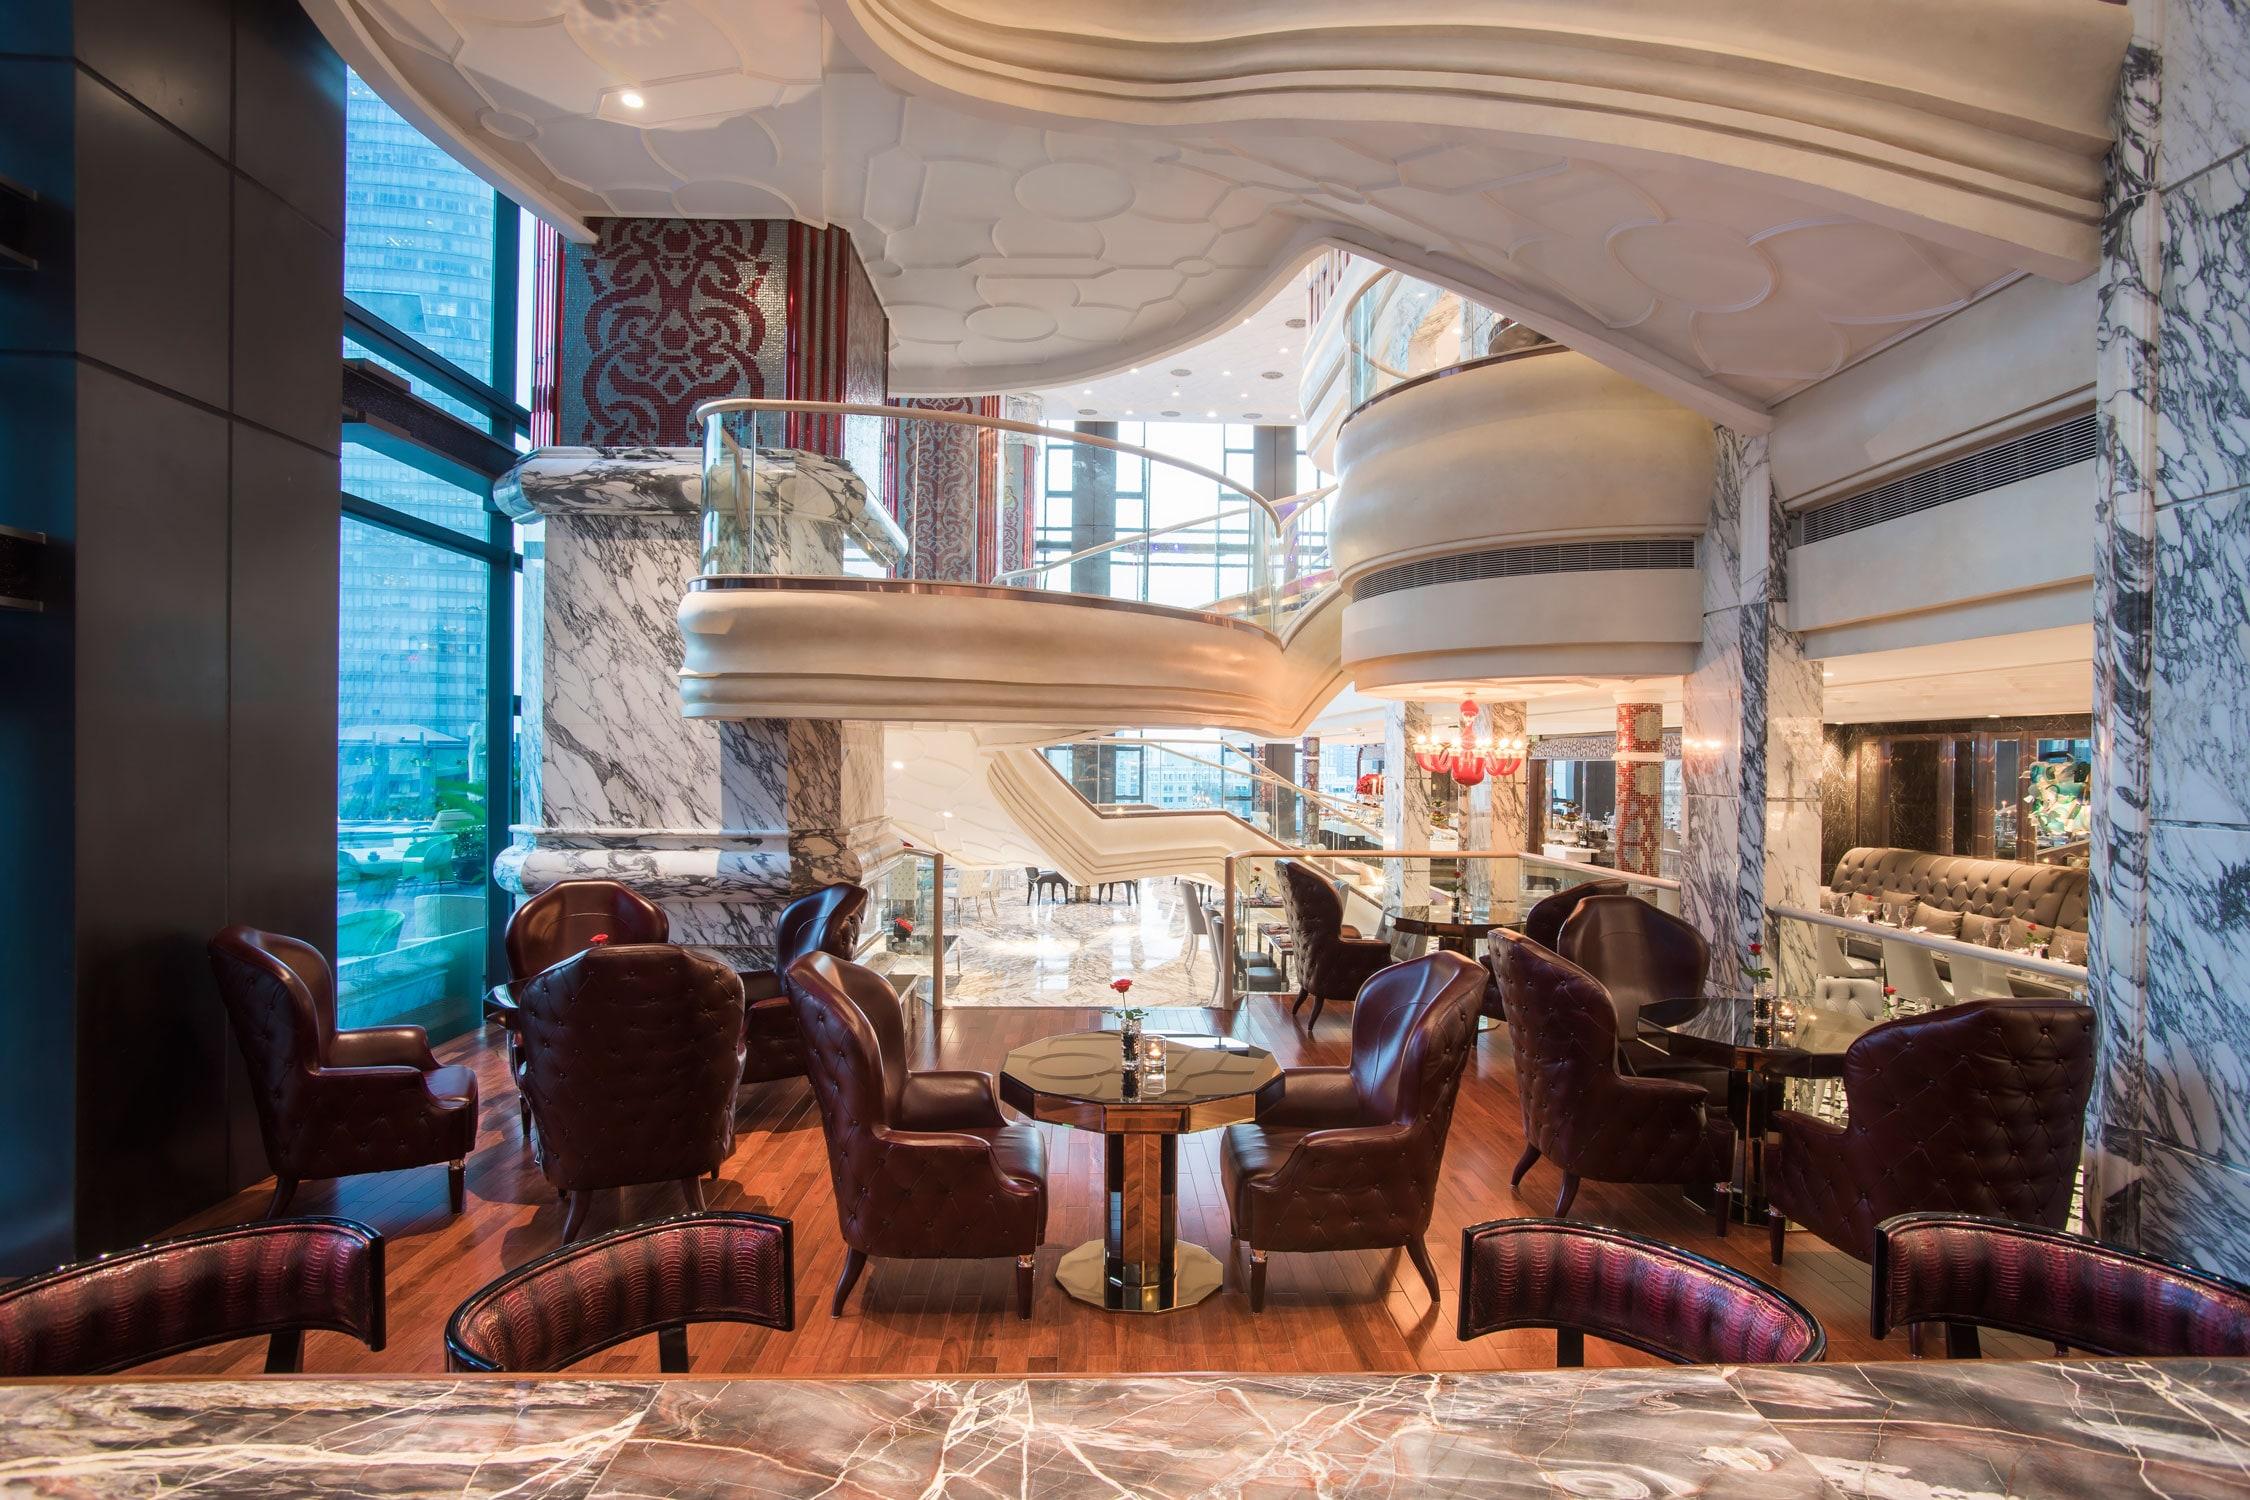 Visionnaire per il The Reverie Saigon Hotel a Ho Chi Minh City